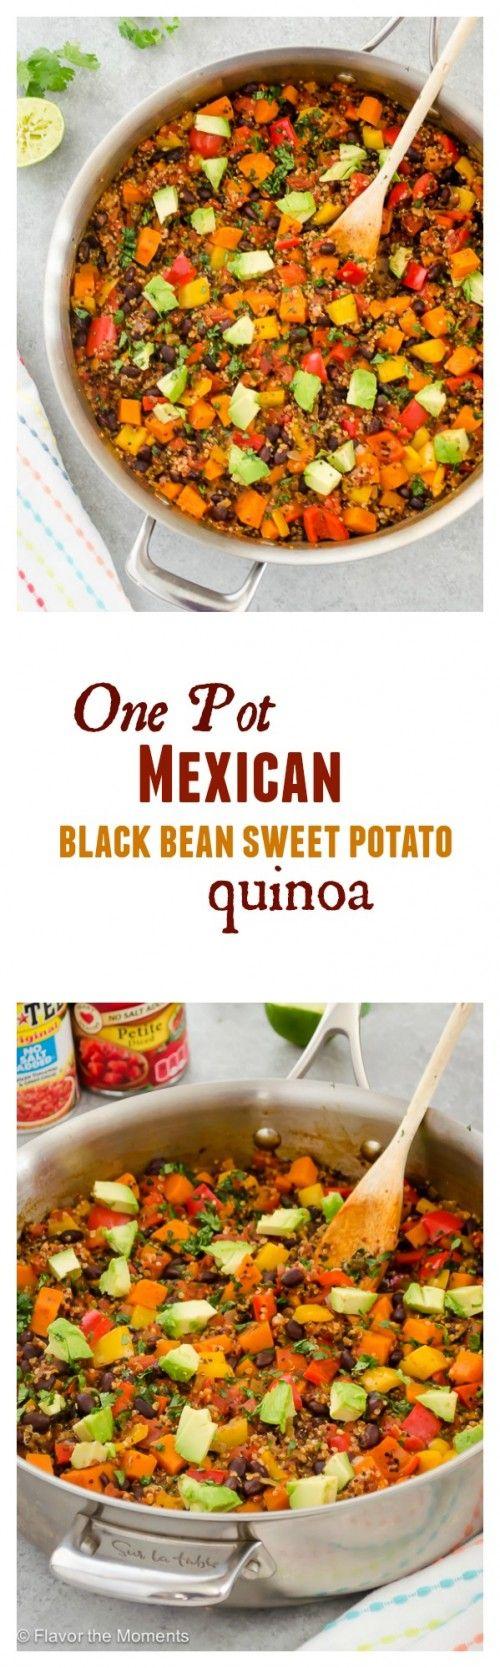 One Pot Mexican Black Bean Sweet Potato Quinoa | flavorthemoments.com